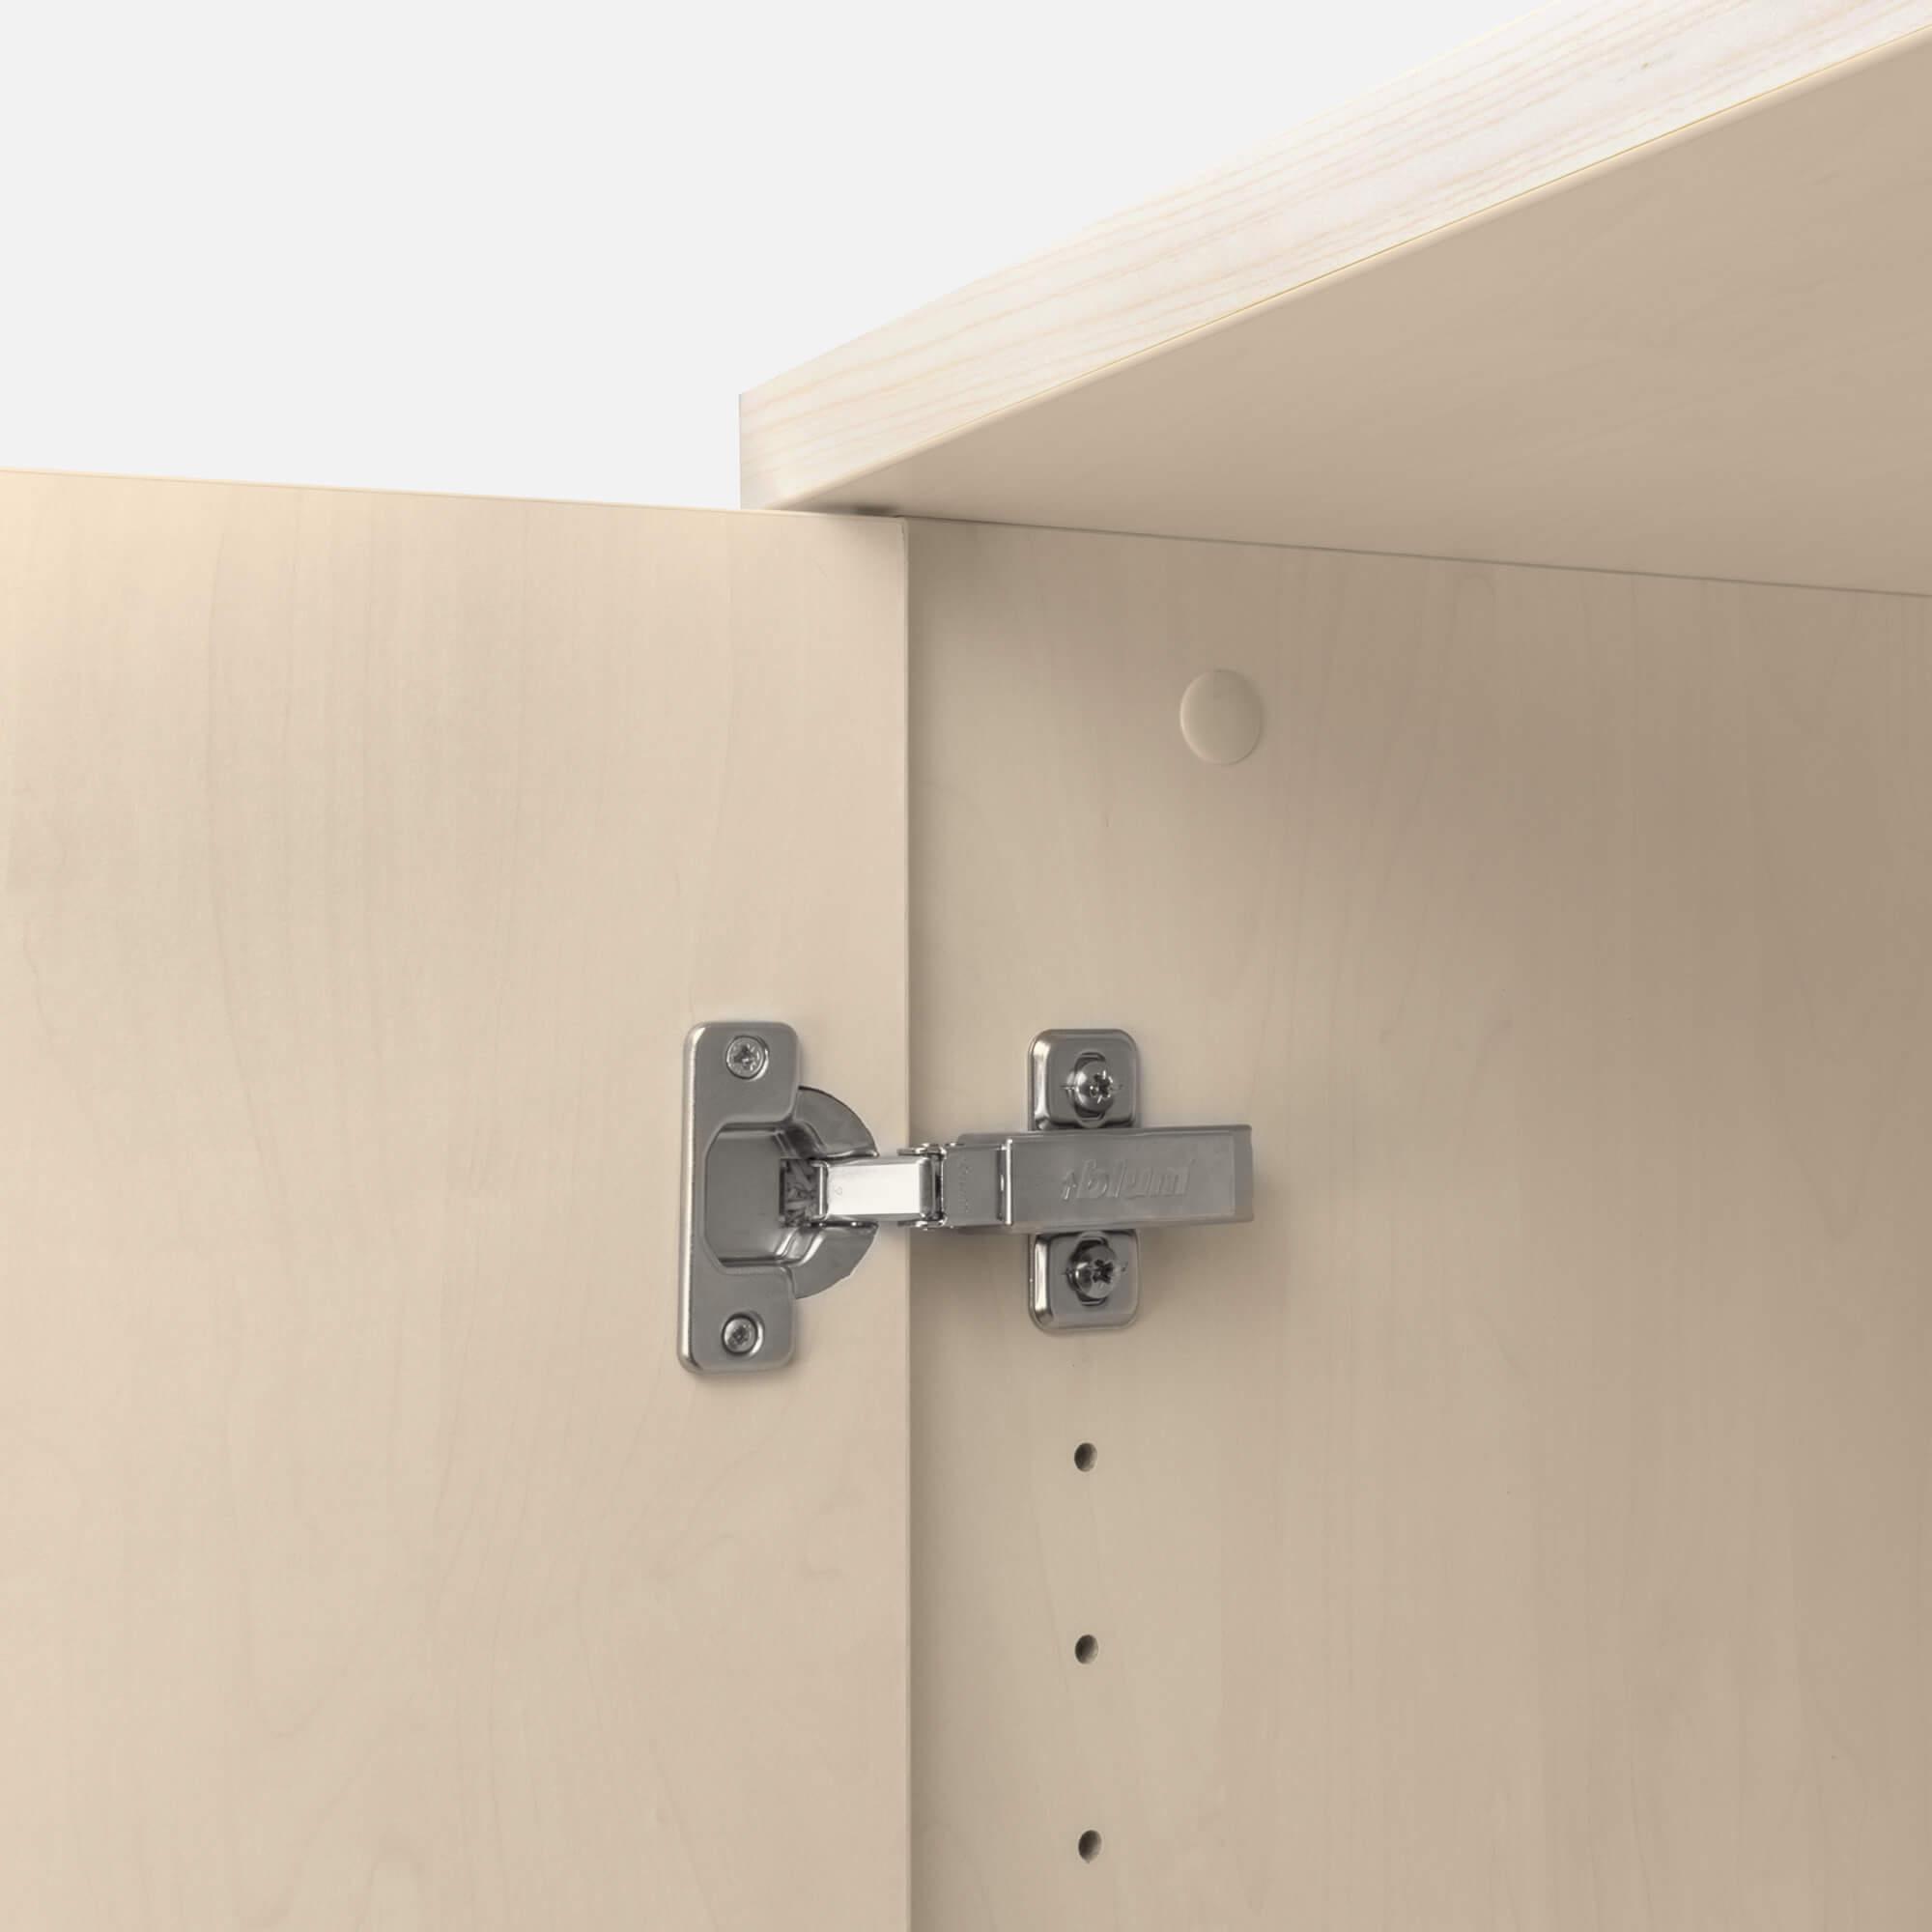 UNI Aktenschrank abschließbar 5 OH Ahorn Schrank Büroschrank Flügeltürenschrank